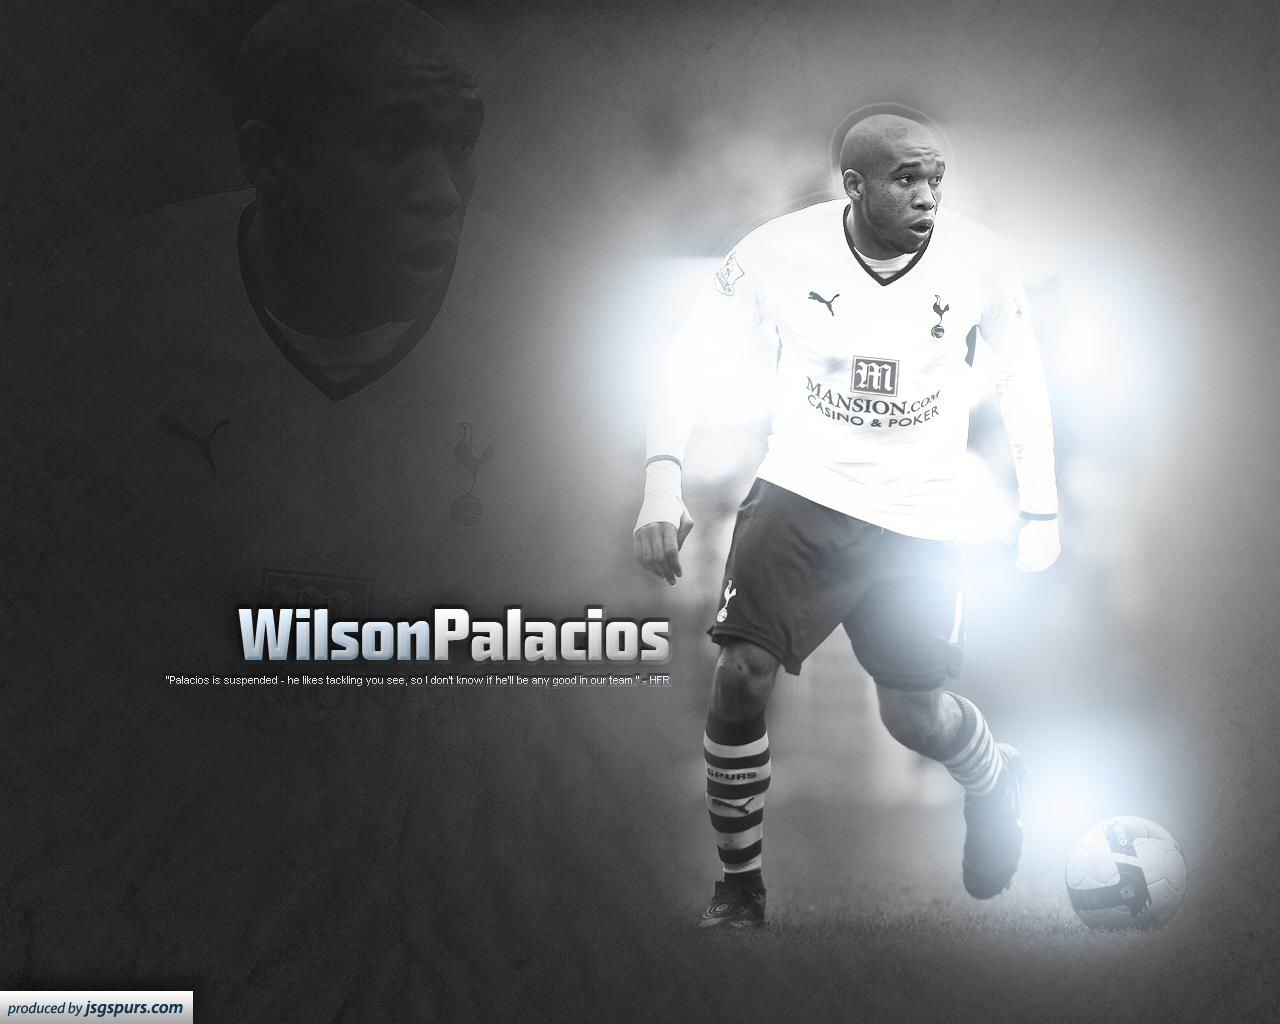 Тоттенхэм Хотспур Уилсон Паласиос сборная Гондураса Уиган Атлетик